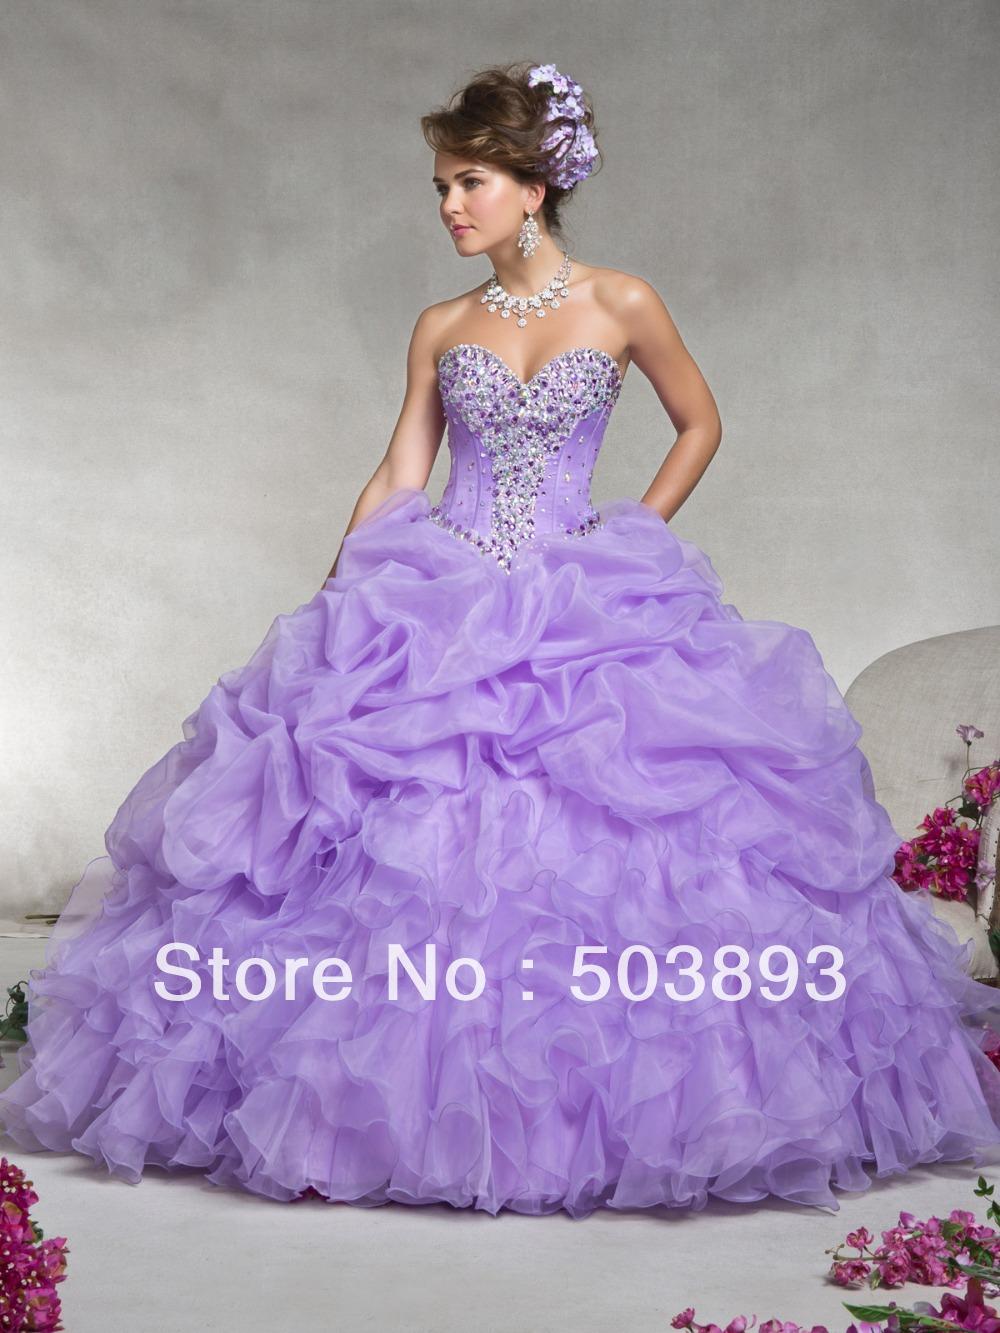 Light Purple Quinceanera Dresses New arrival dresses